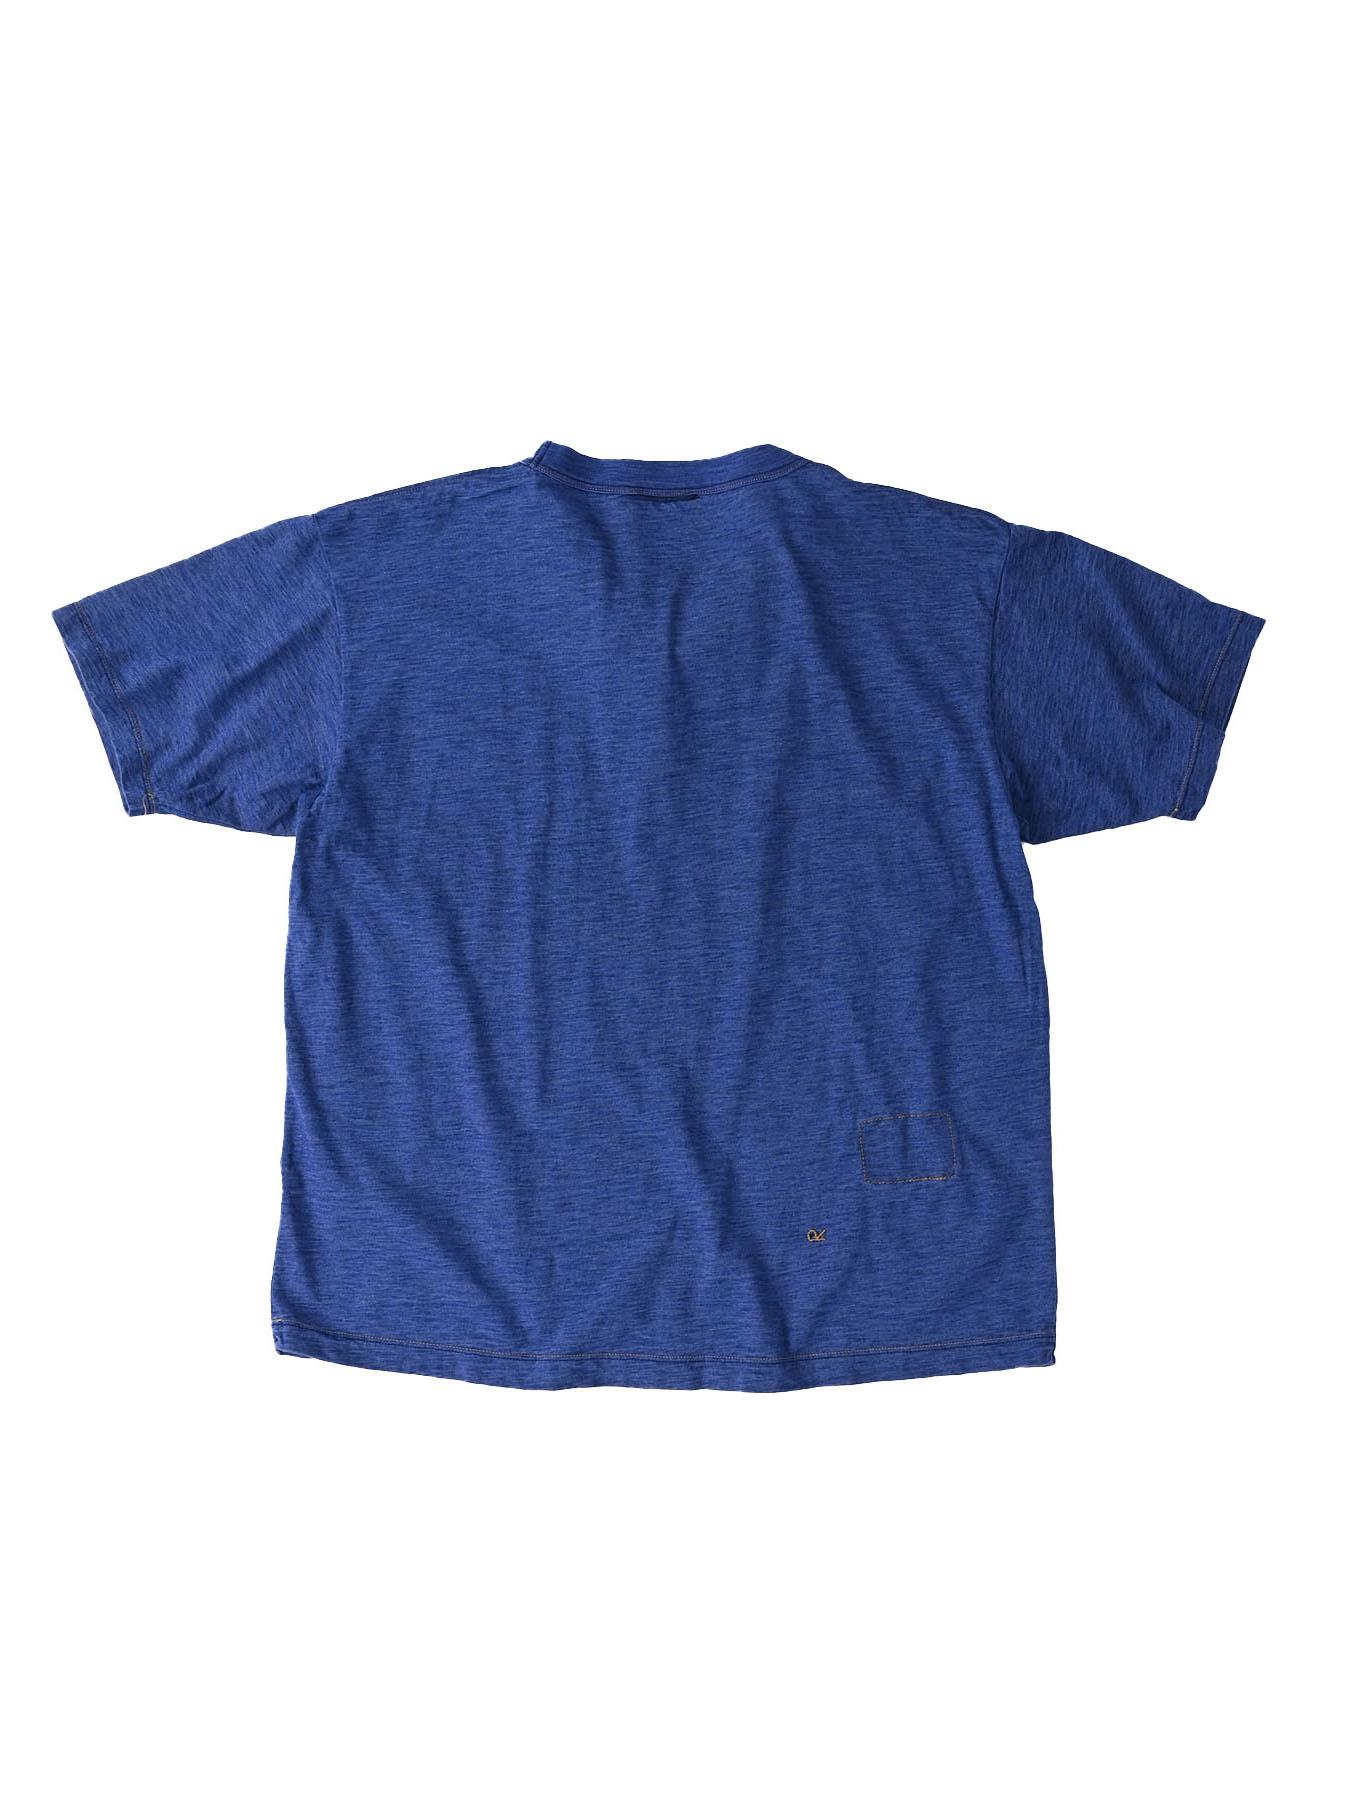 Indigo Tenjiku Lei Frill Ocean T-shirt (0621)-6